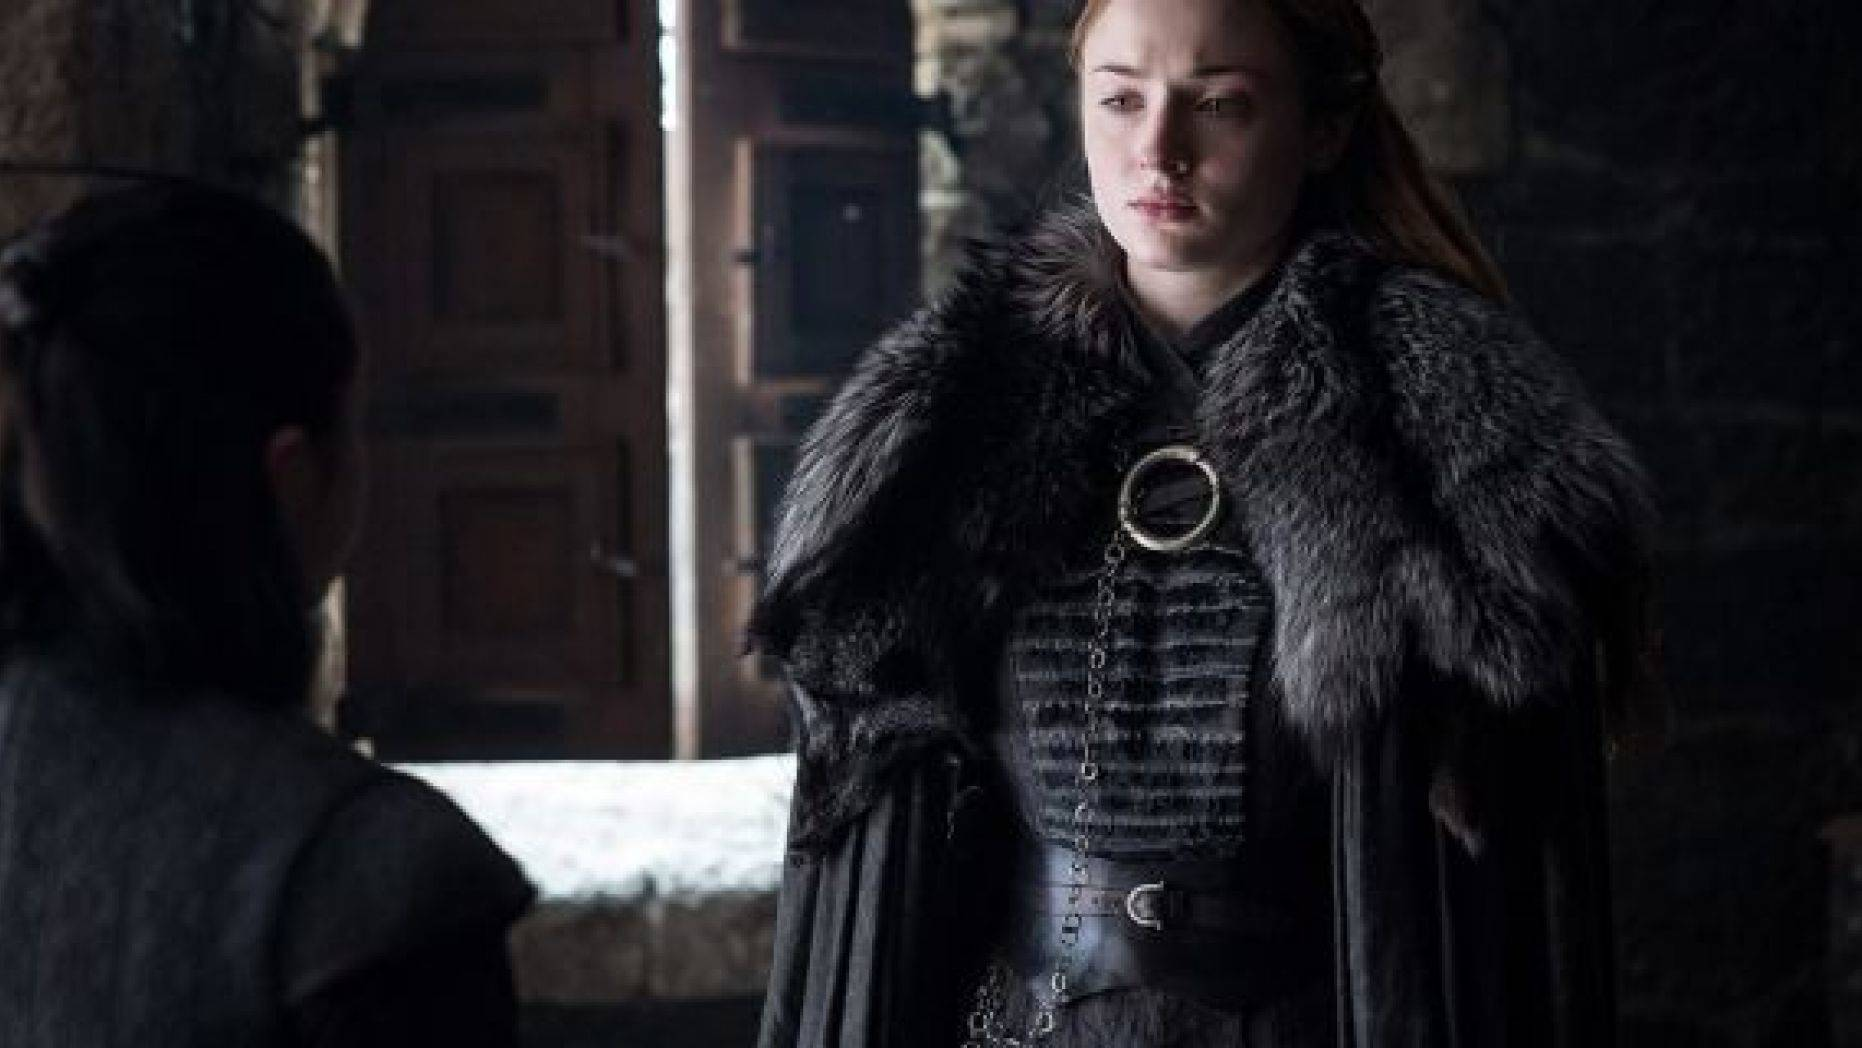 'Game of Thrones' final Season Returns in 2019